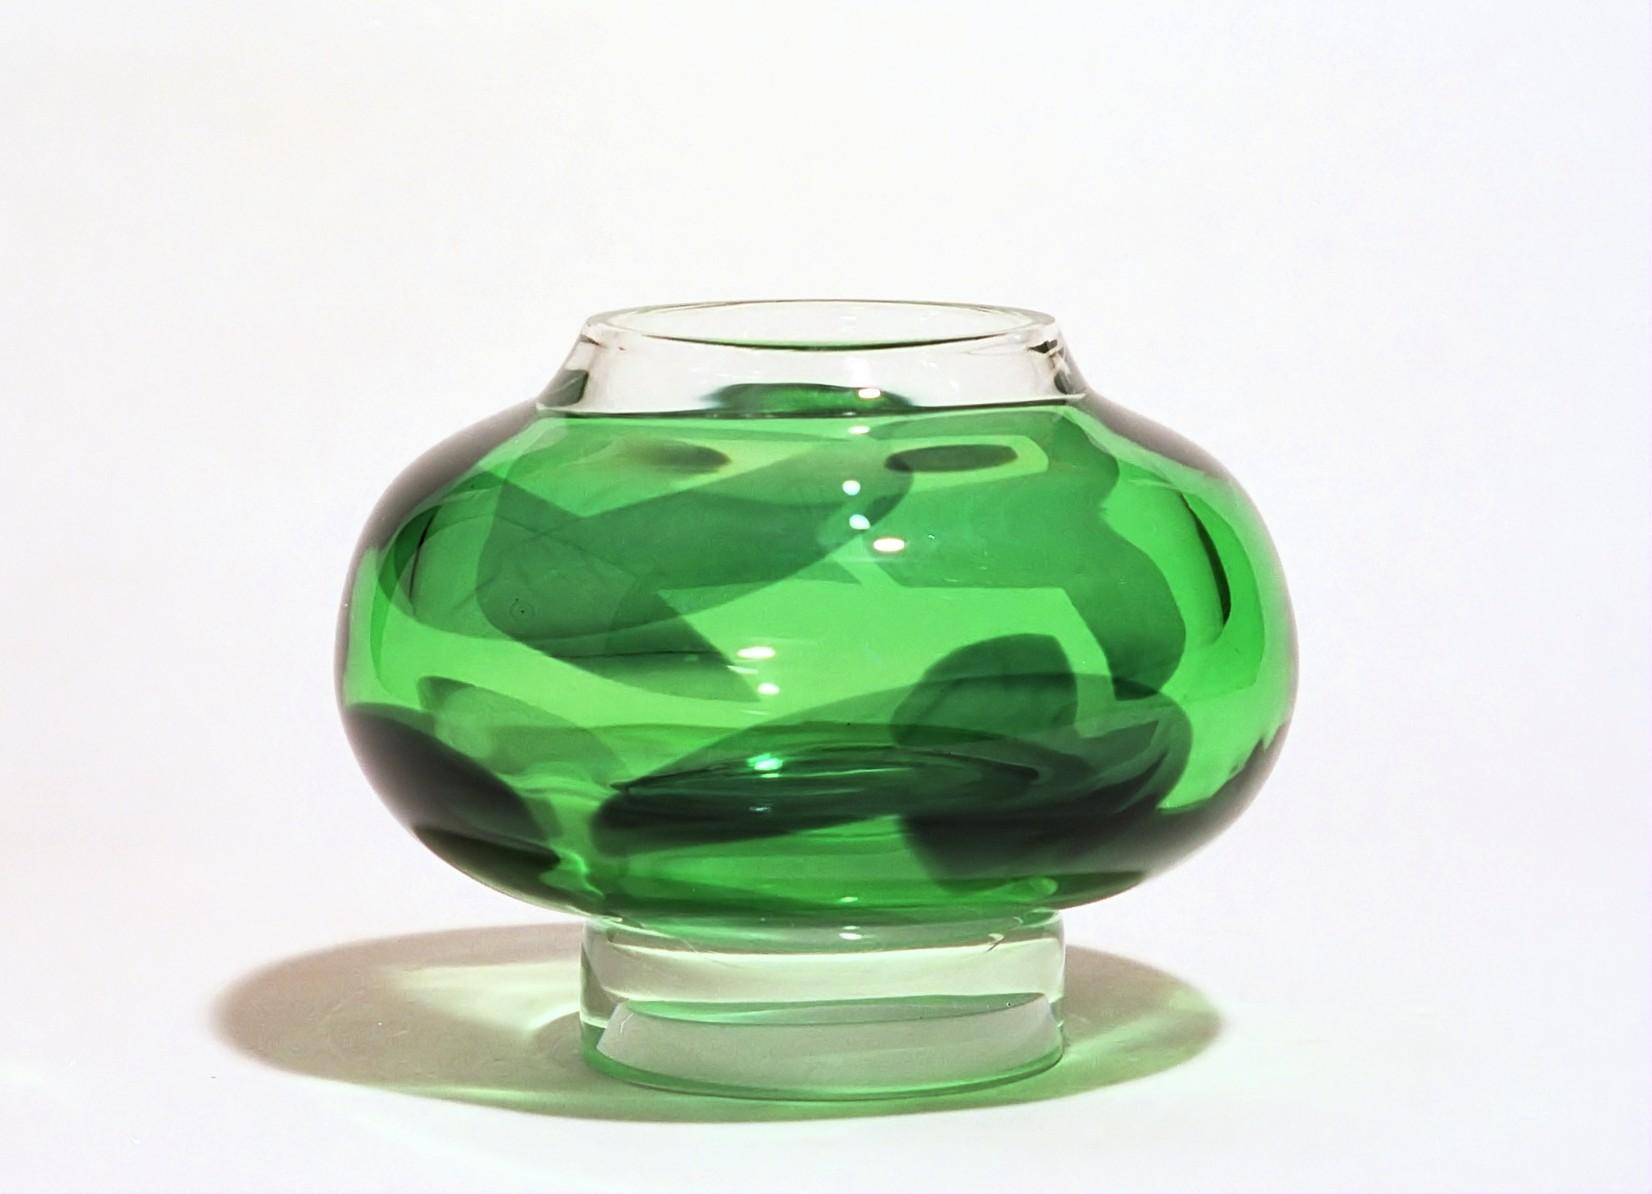 Groen-groen graal